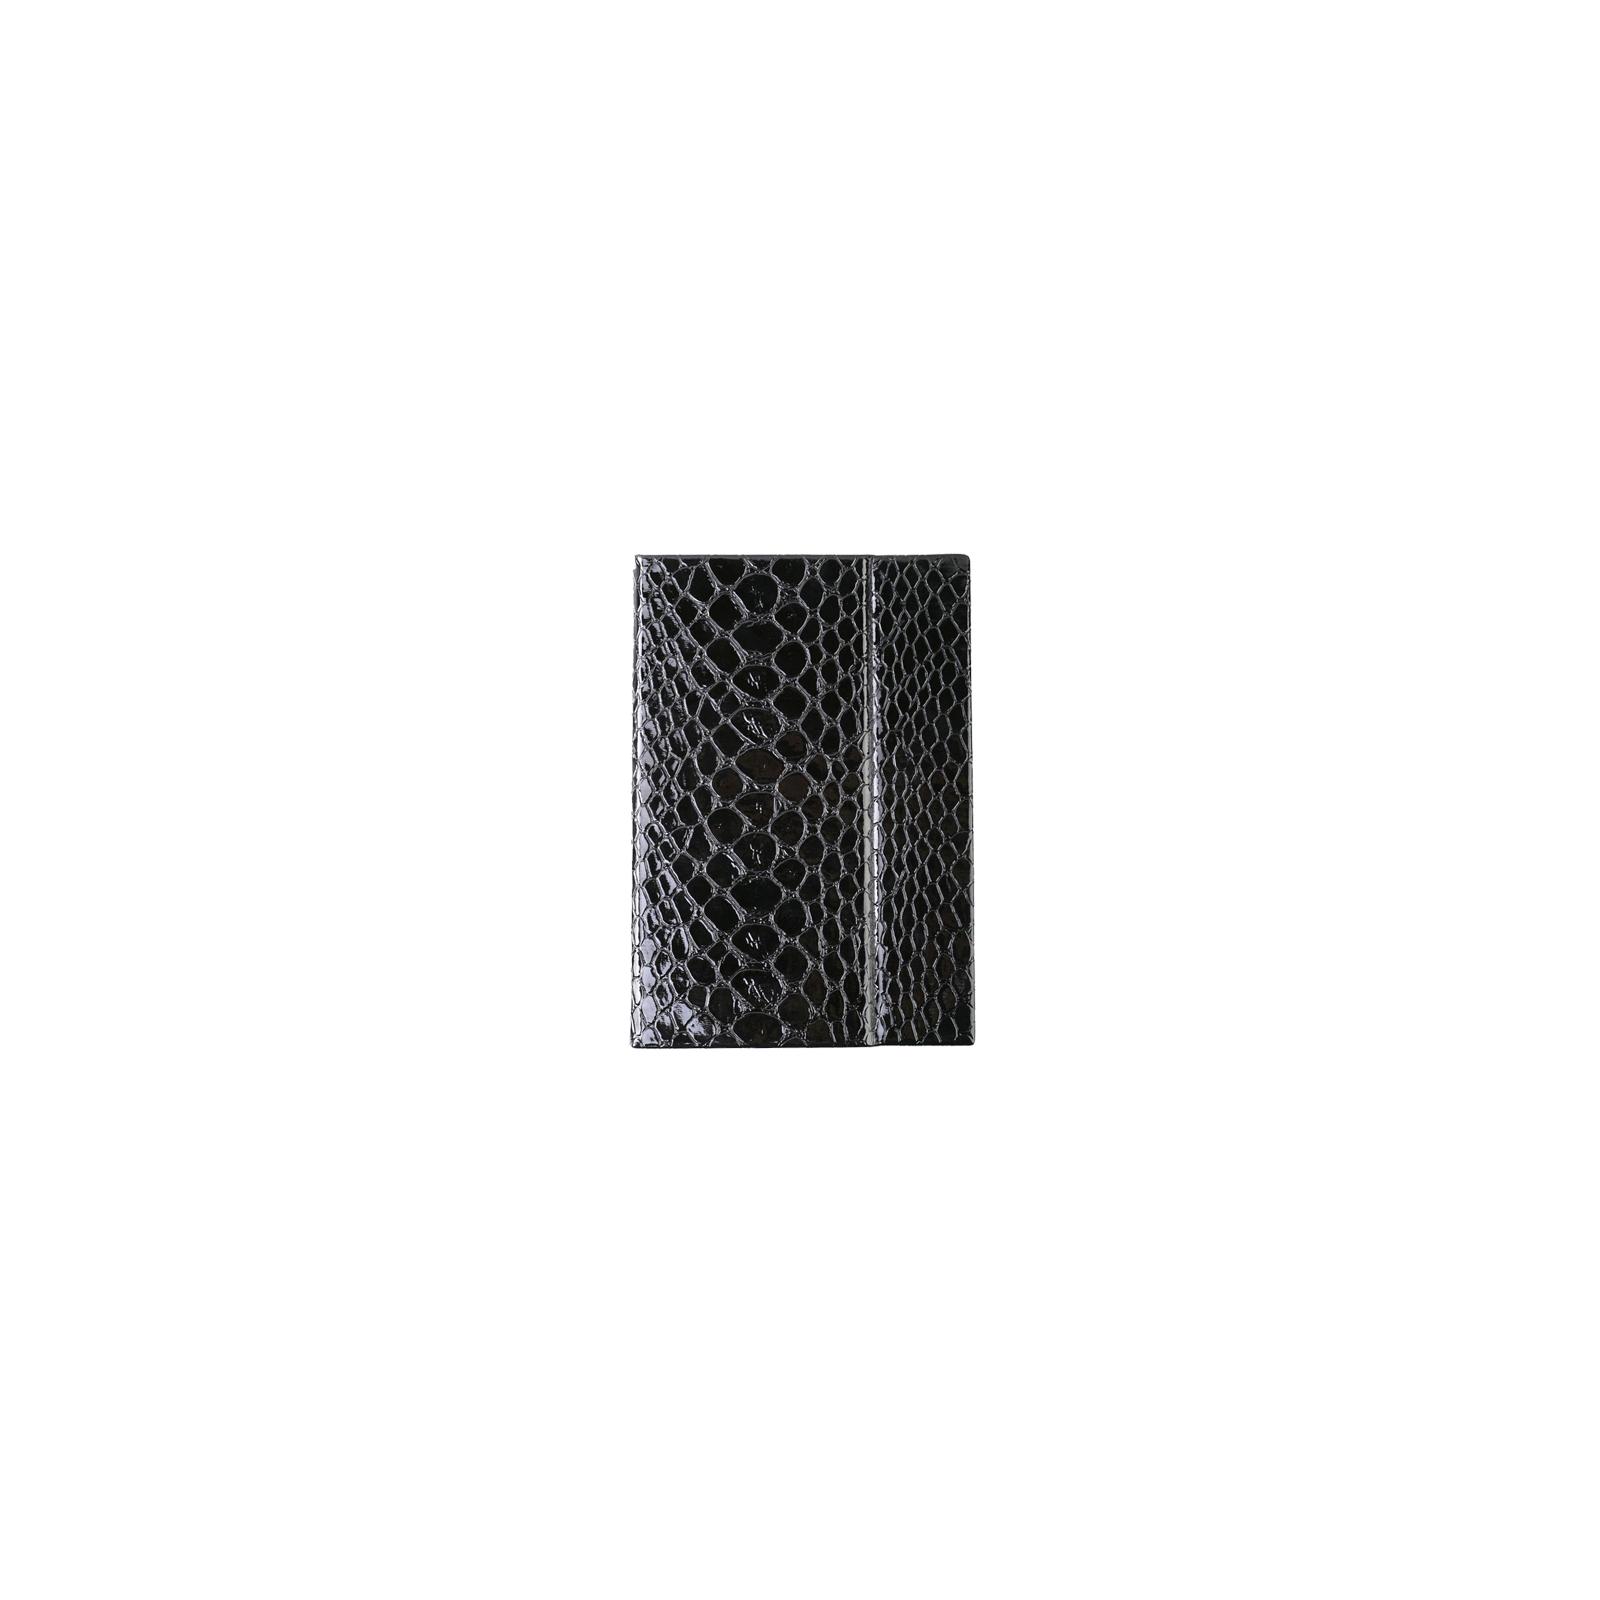 Чехол для планшета Vento 7 Desire glossy - black reptile изображение 2